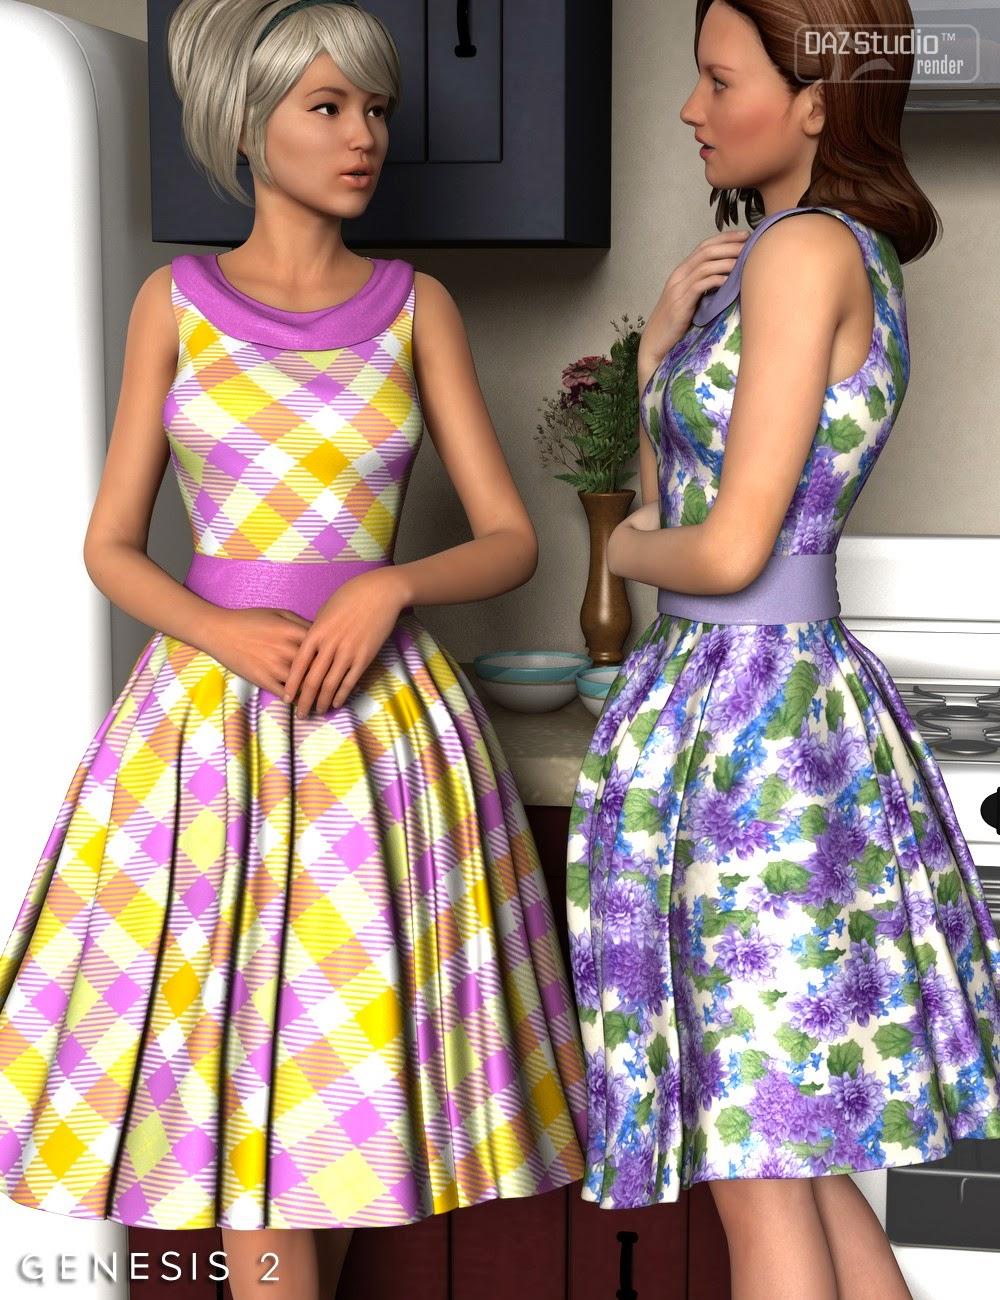 3d Models Art Zone - Take Me Back Dress for Genesis 2 Female(s)